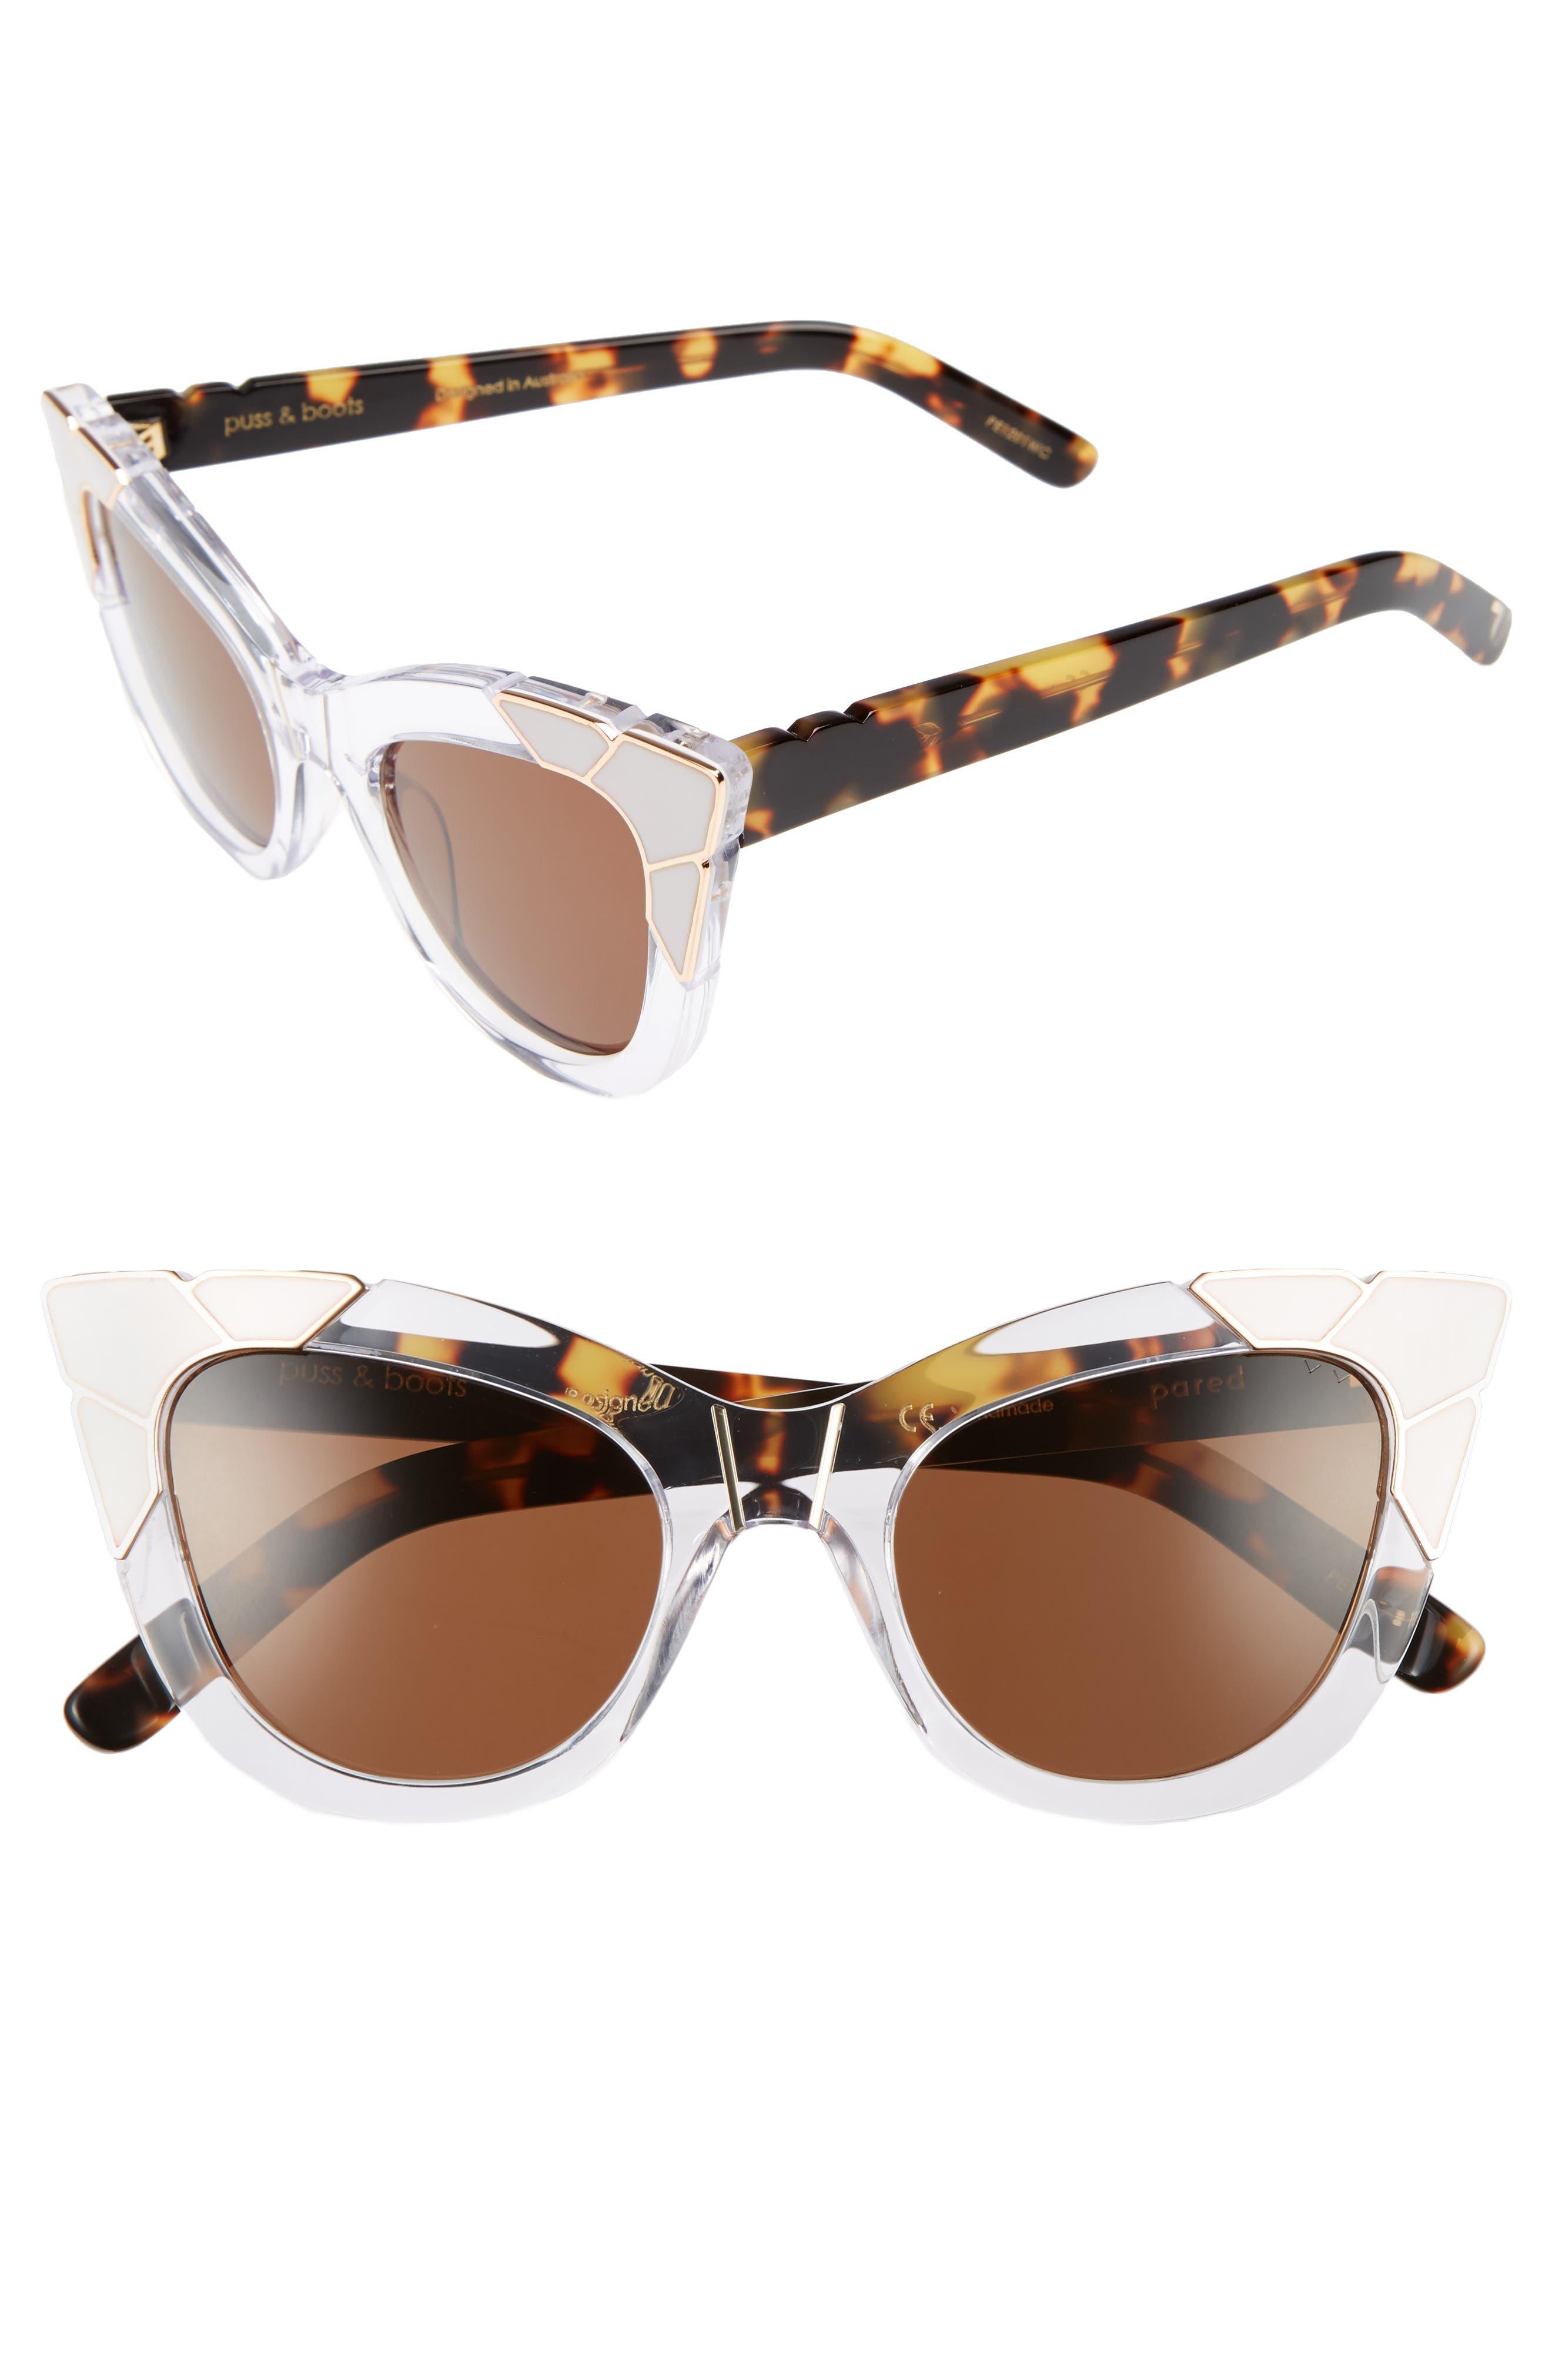 Pared Puss & Boots 49mm Cat Eye Sunglasses